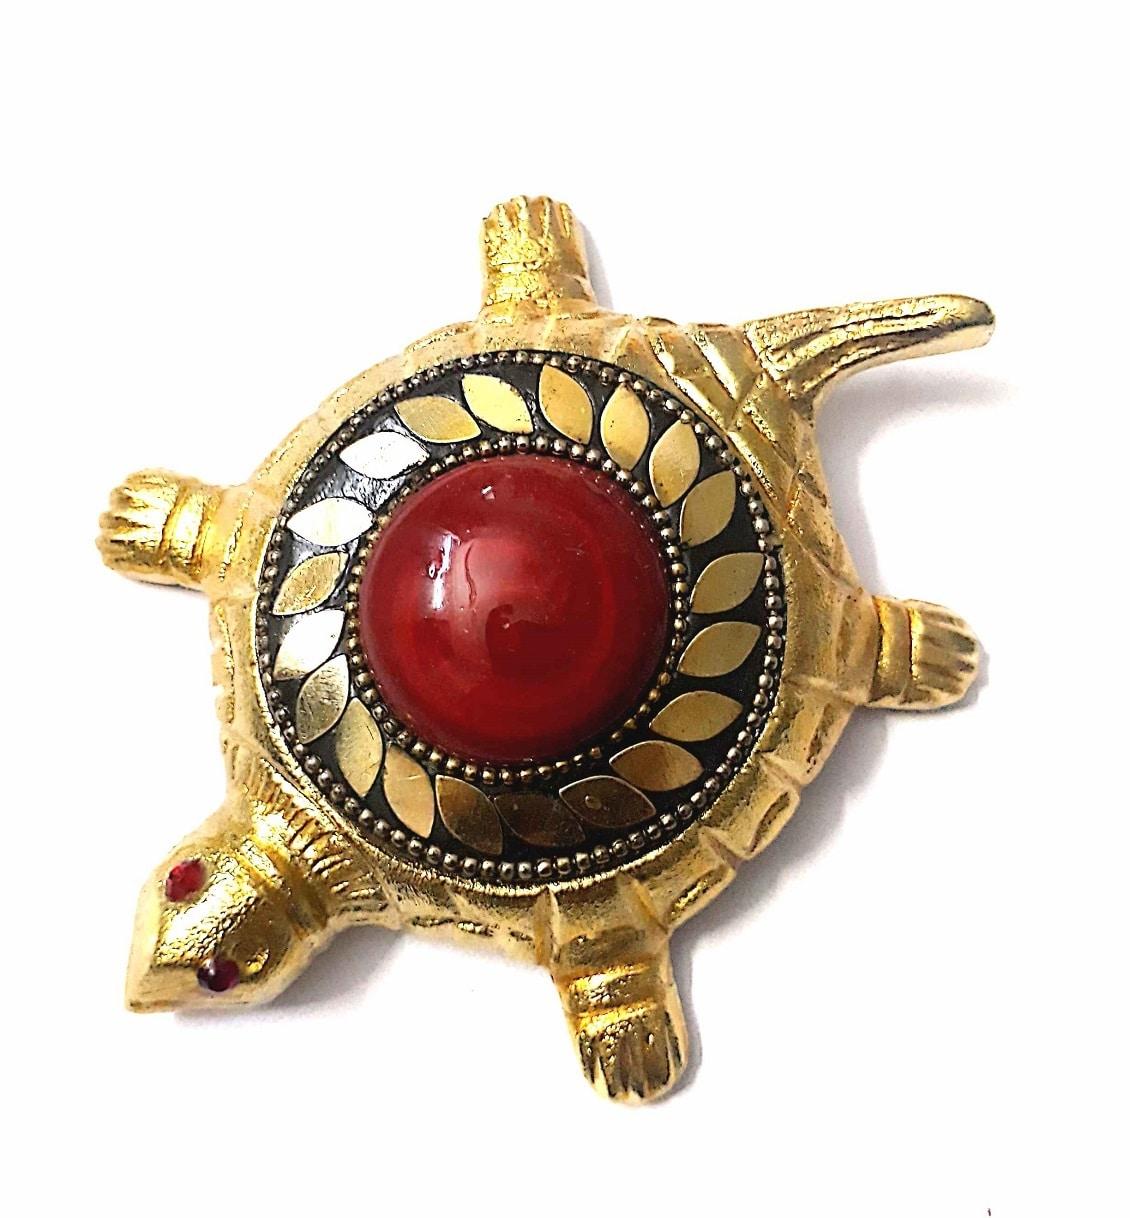 Numeroastro Shri Vyapar Vridhi Yantra On Brass Turtle | Tortoise (Small) With Golden Beaded Design (Red) (11 Cms) (1 Pc)